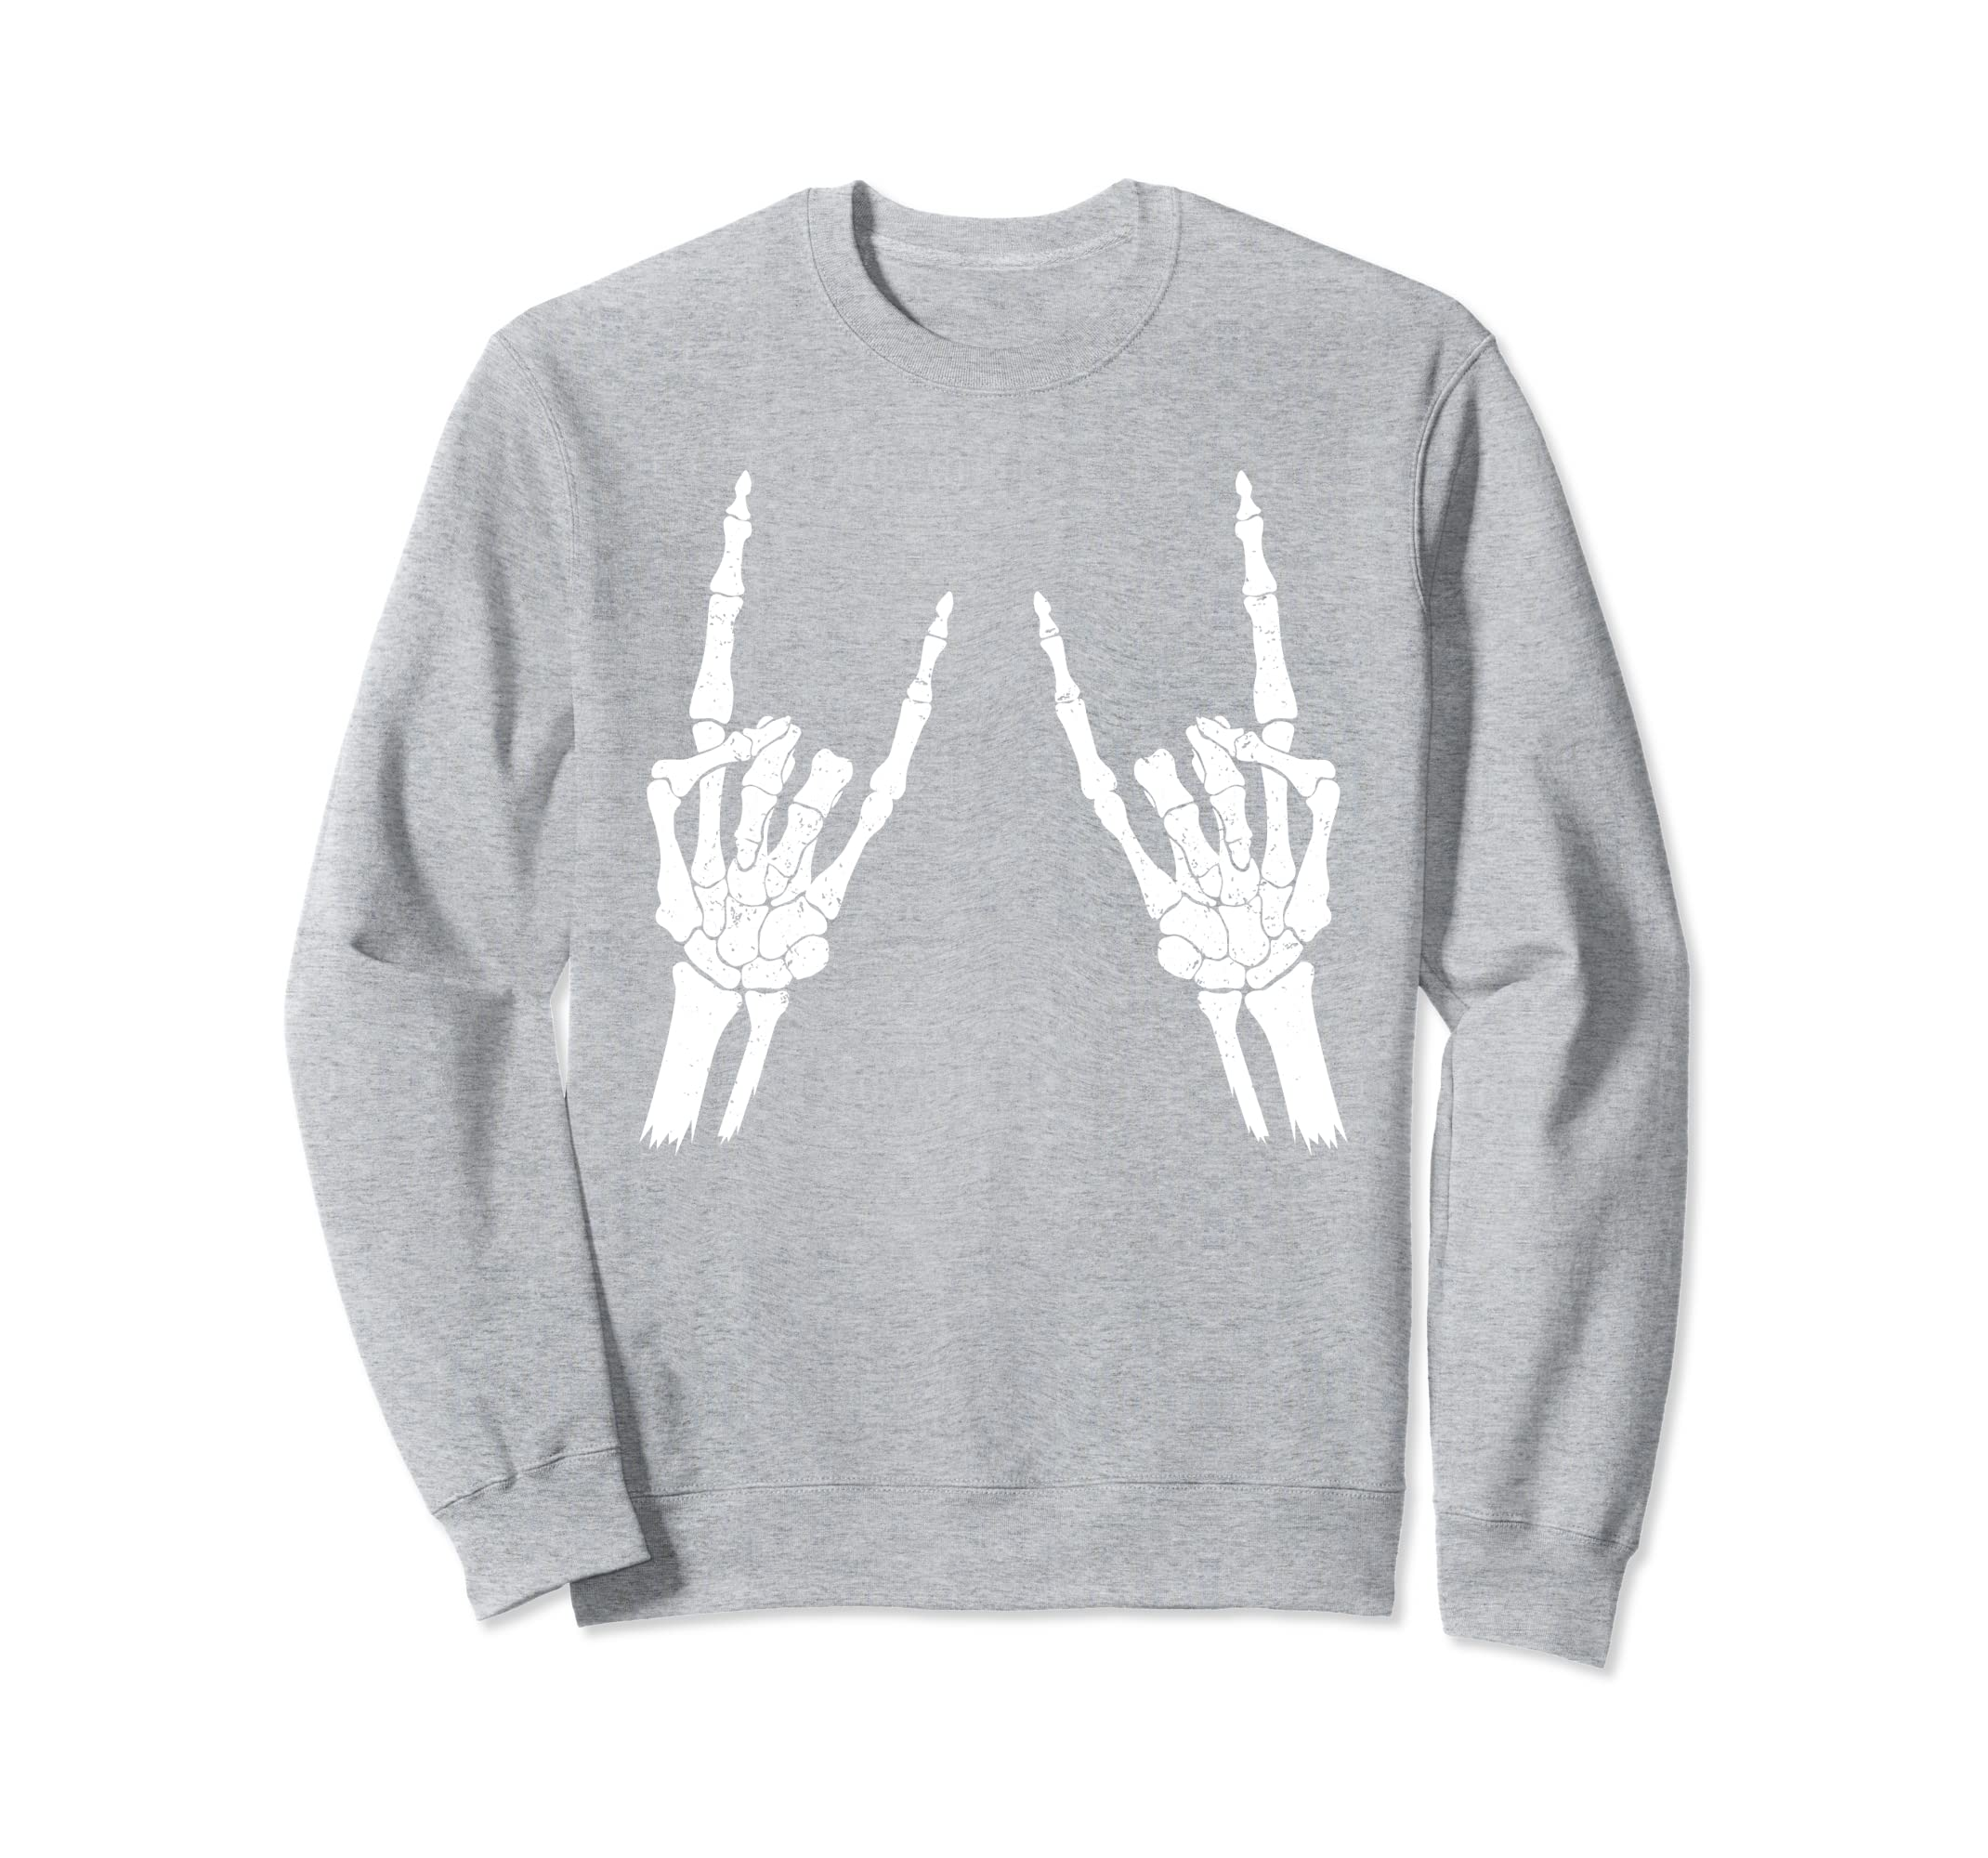 Skeleton Rocker Sweatshirt Halloween Trick Or Treat Gift-Rose